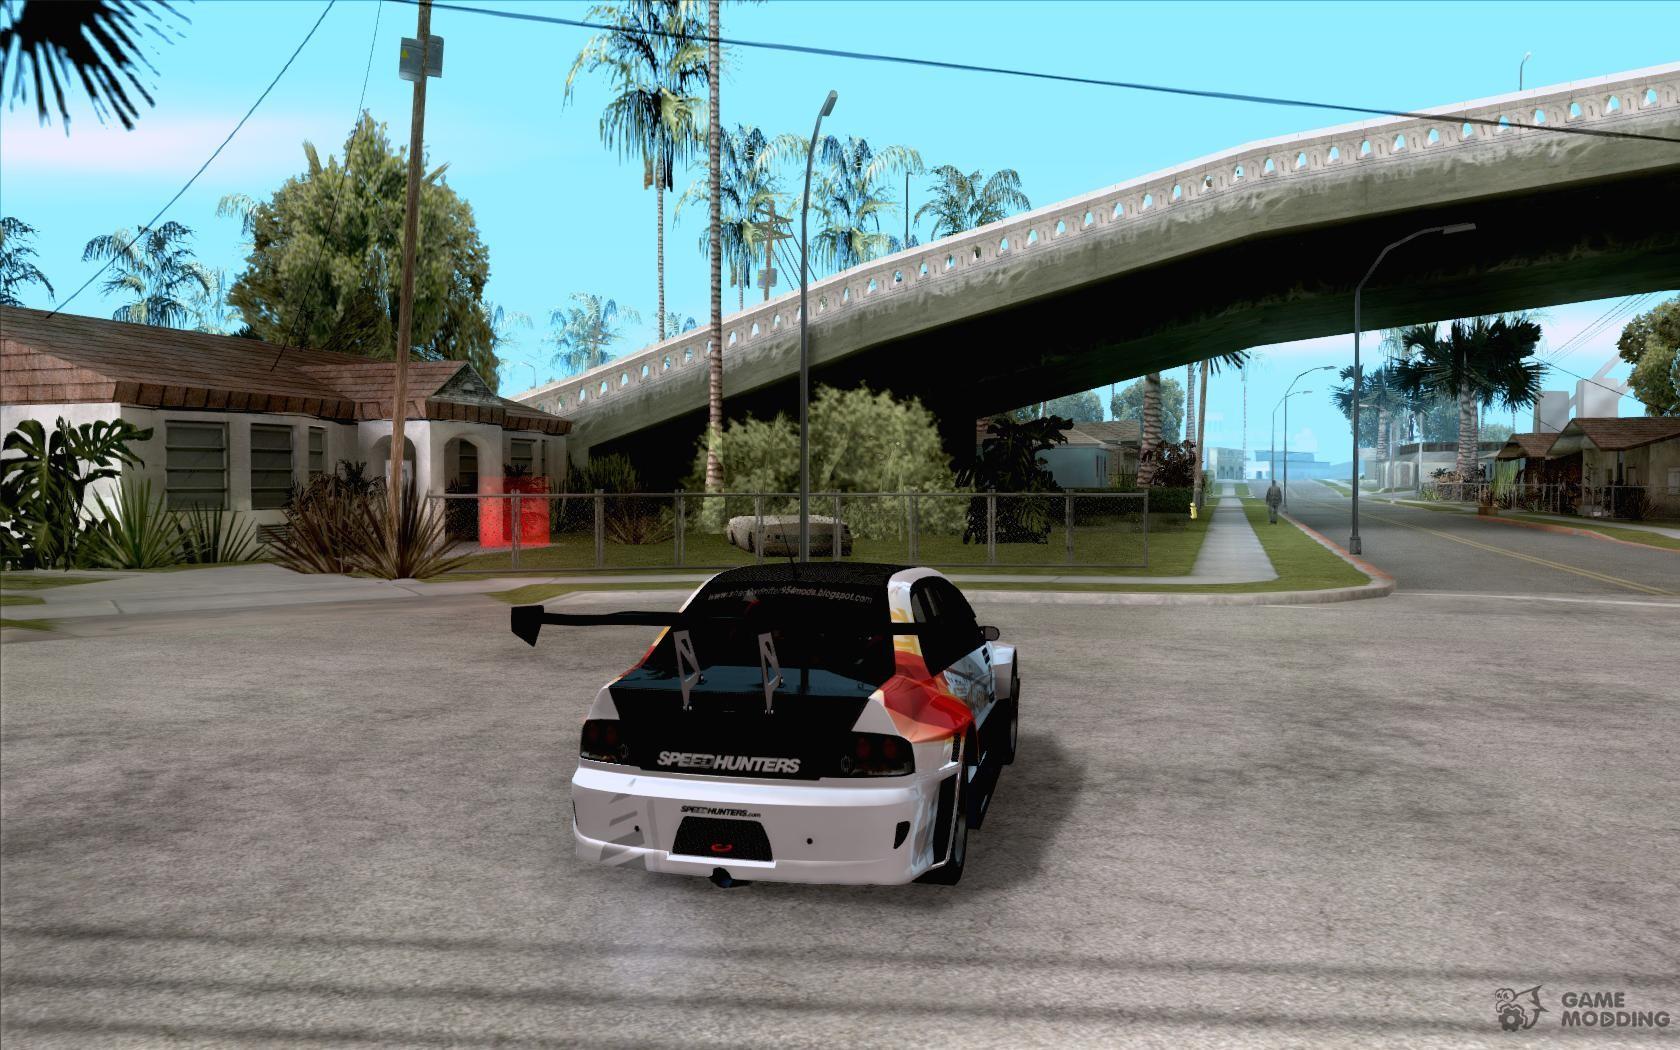 Mitsubishi lancer evo ix speedhunters edition for gta san andreas top view